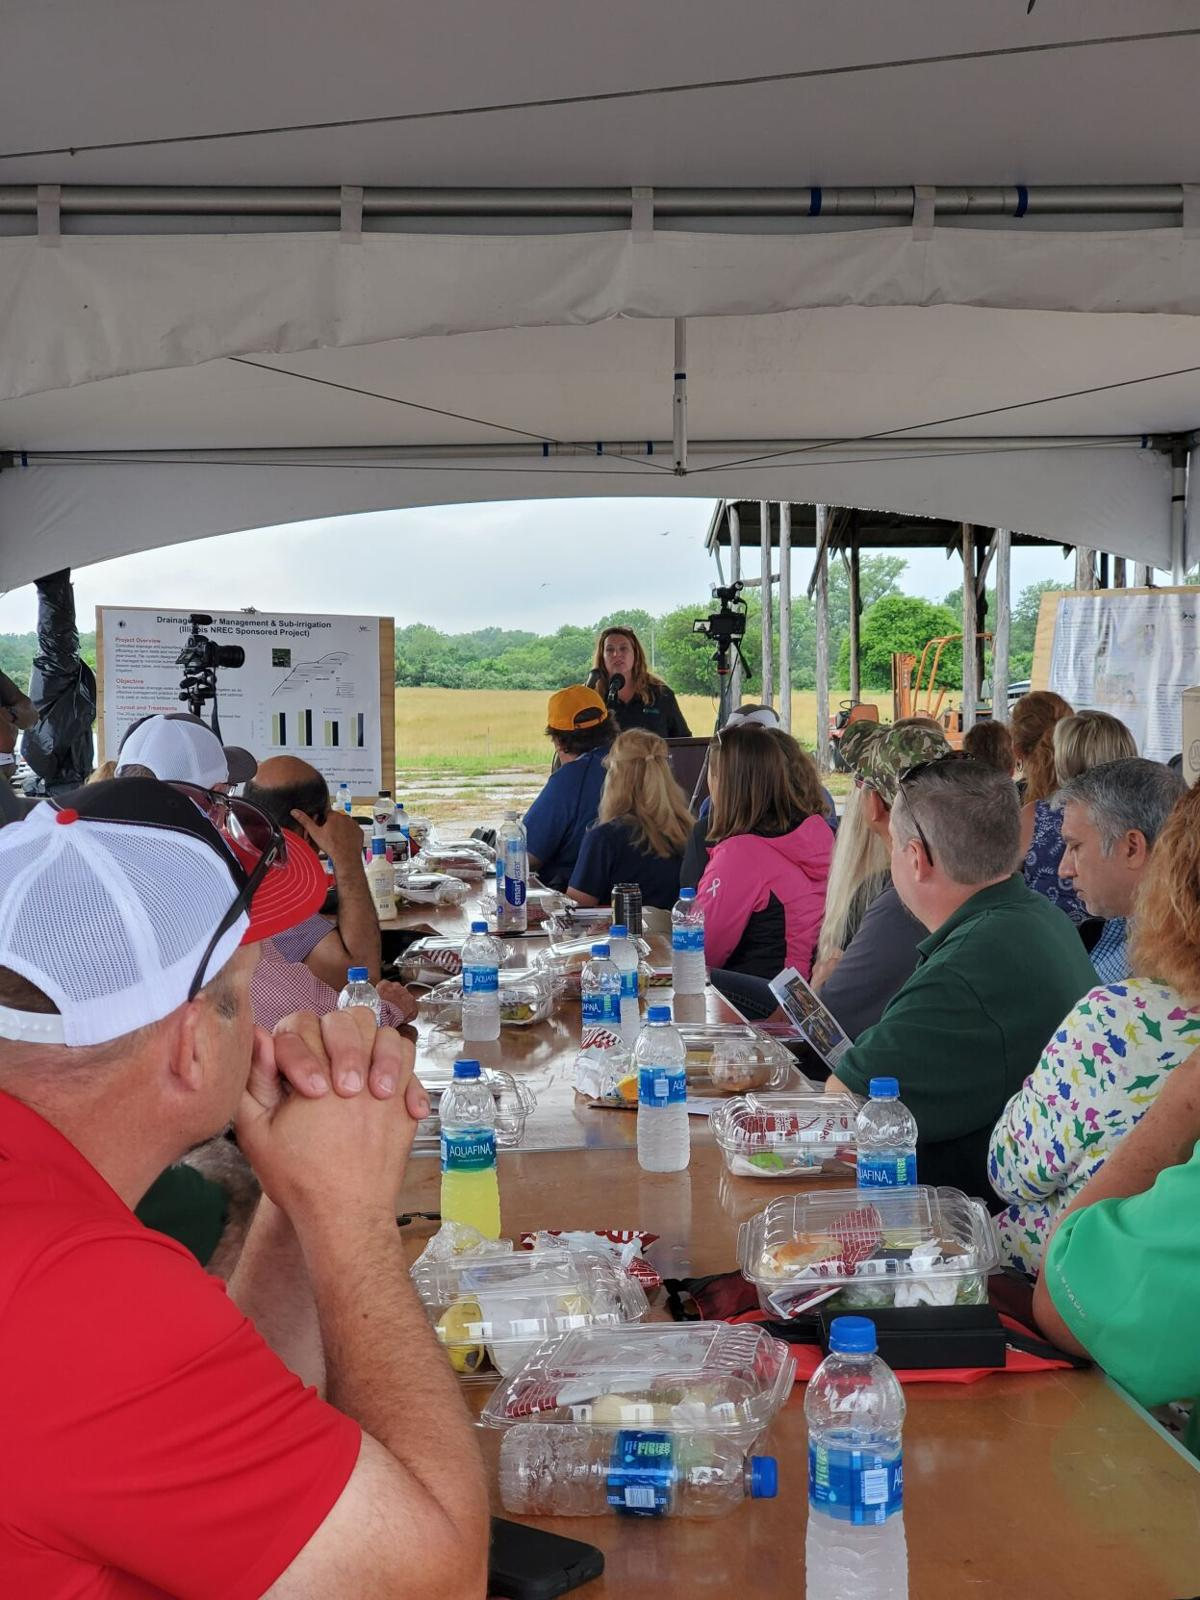 Farmers get rainy glimpse of nutrient stewardship at work